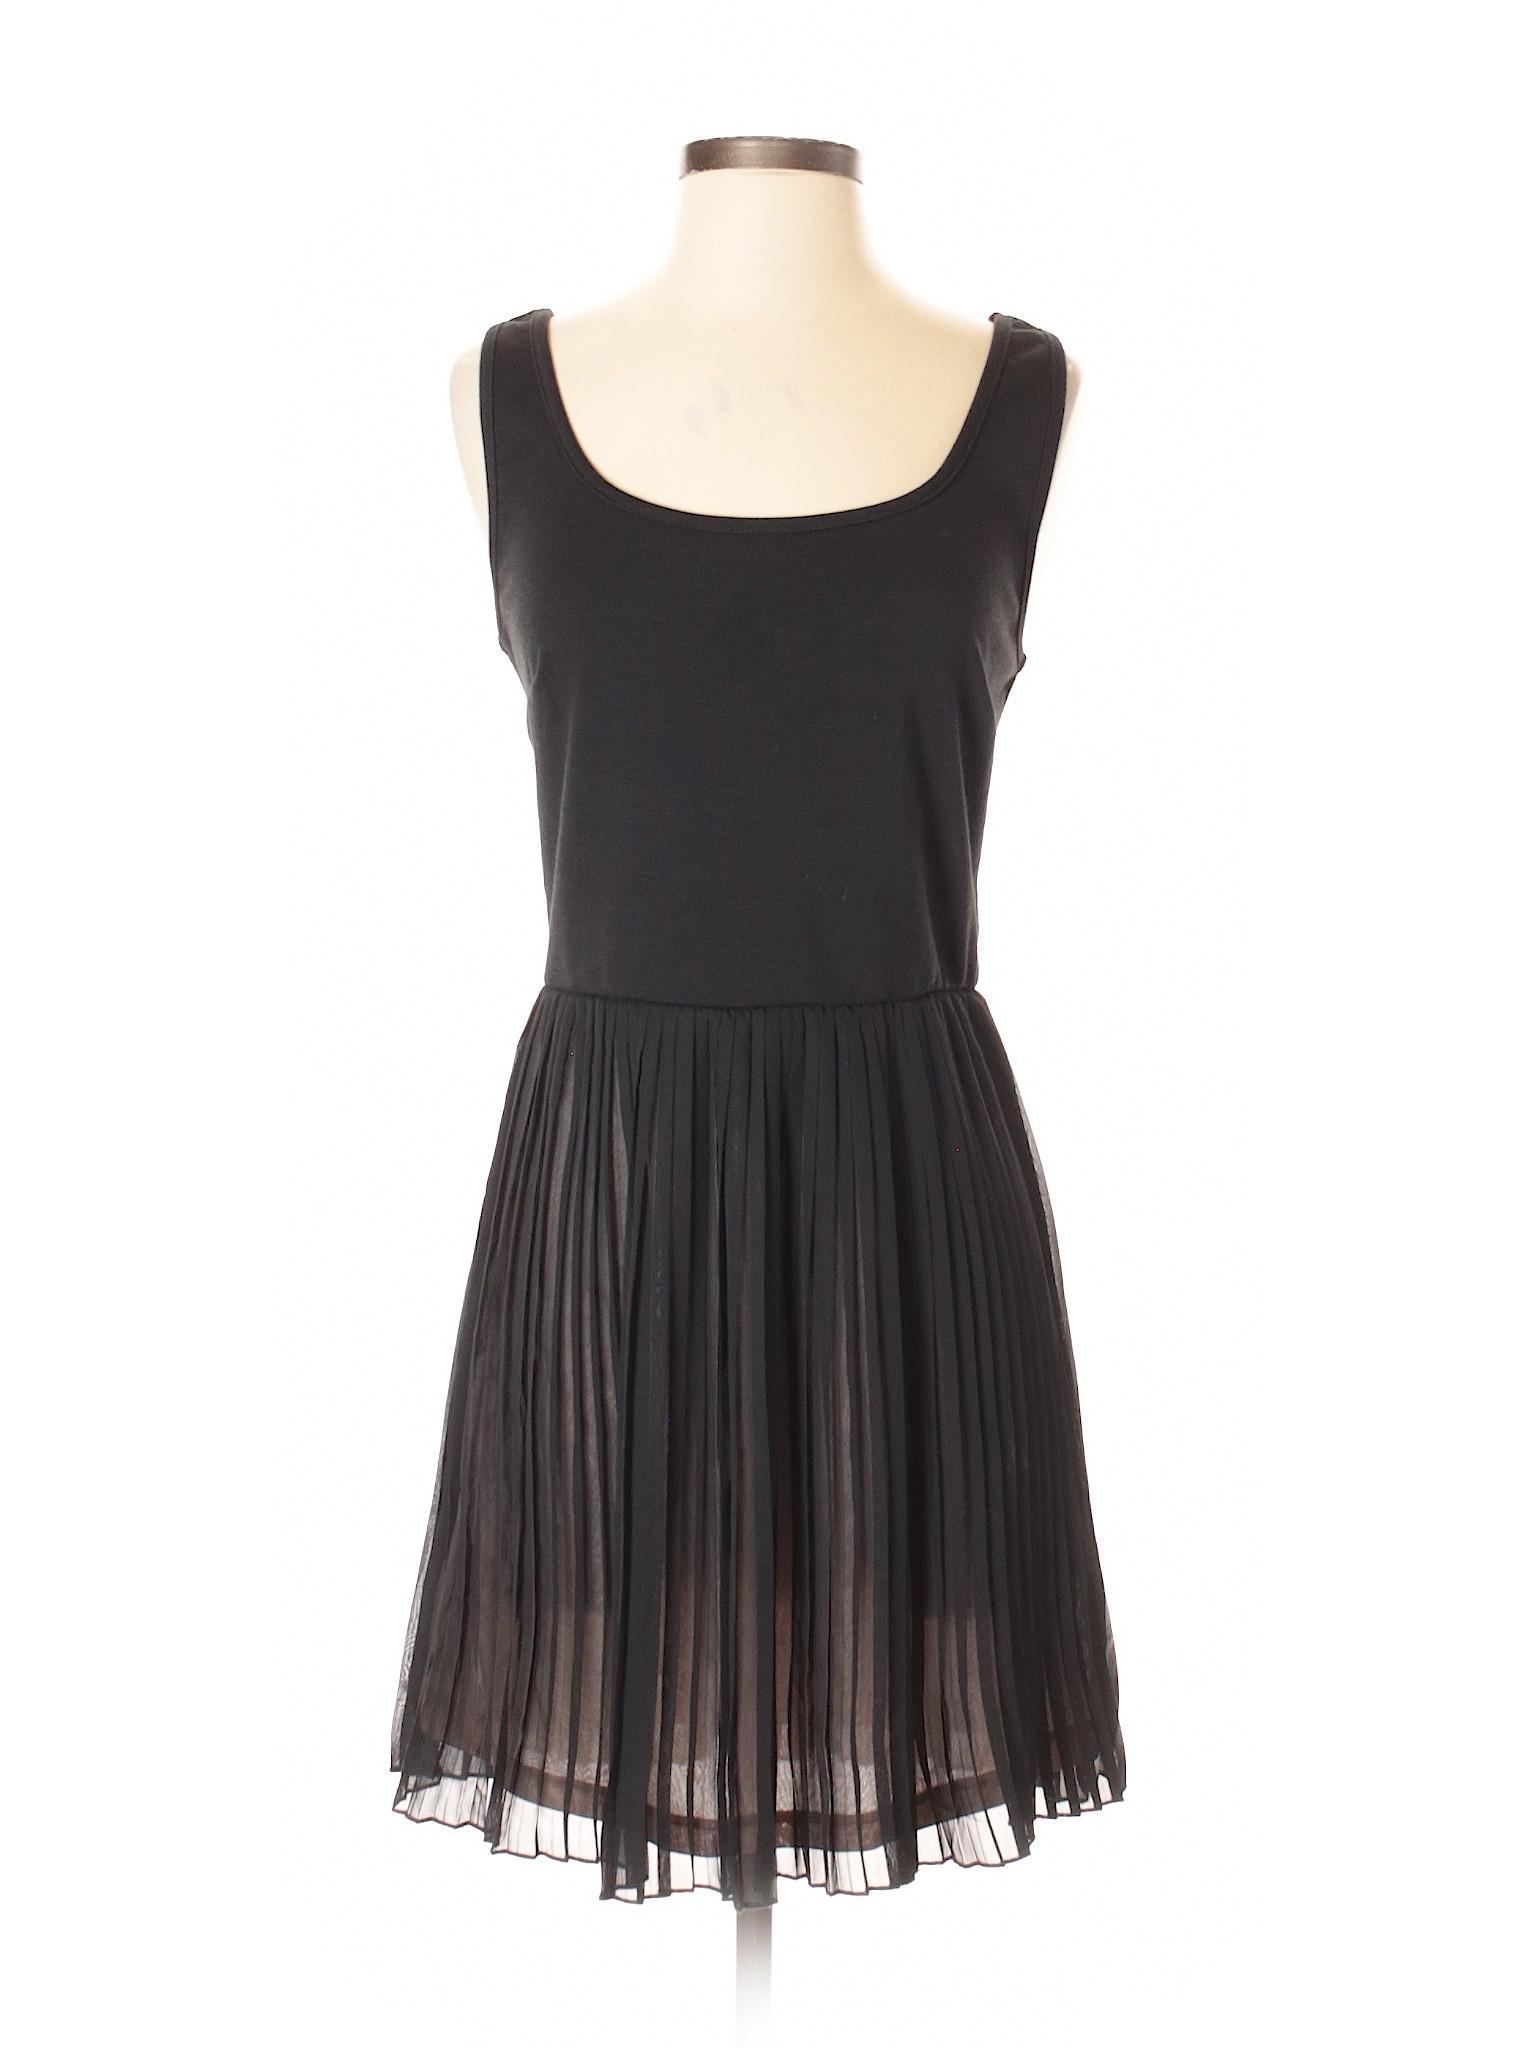 Casual Boutique Dress Chica Mimi winter nqpXqBwvx8